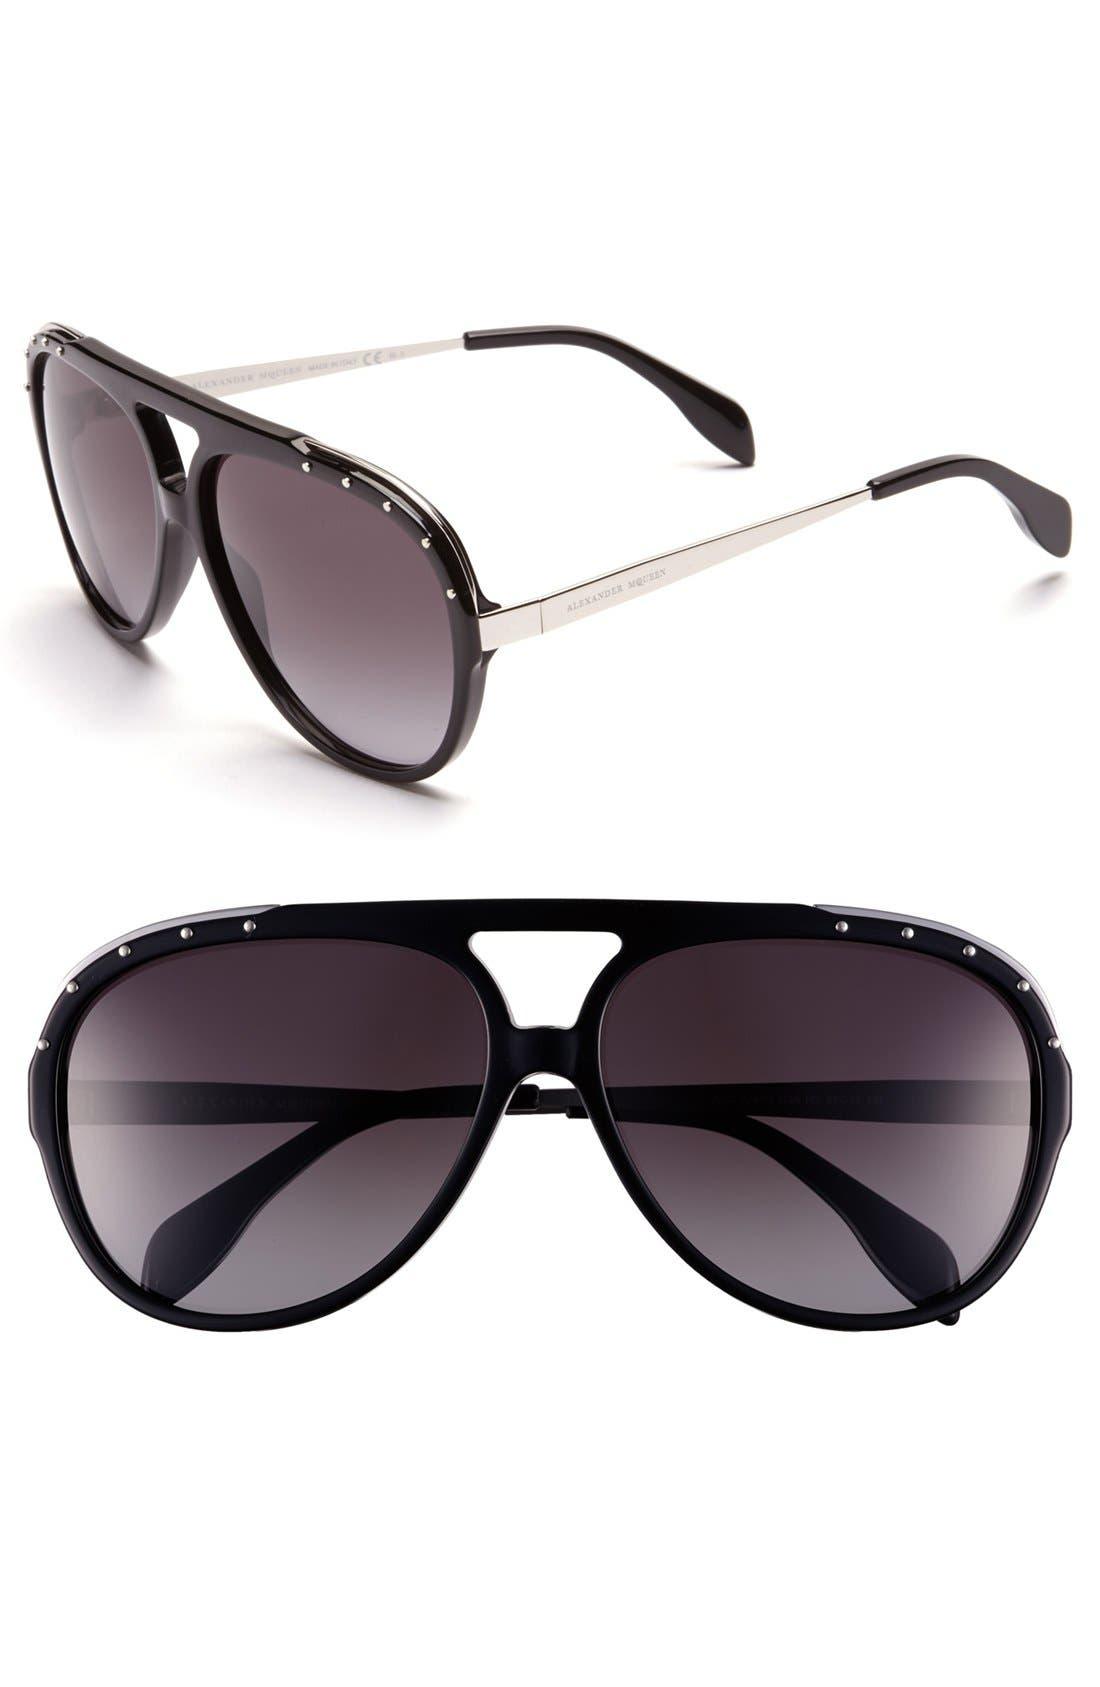 Main Image - Alexander McQueen 61mm Aviator Sunglasses